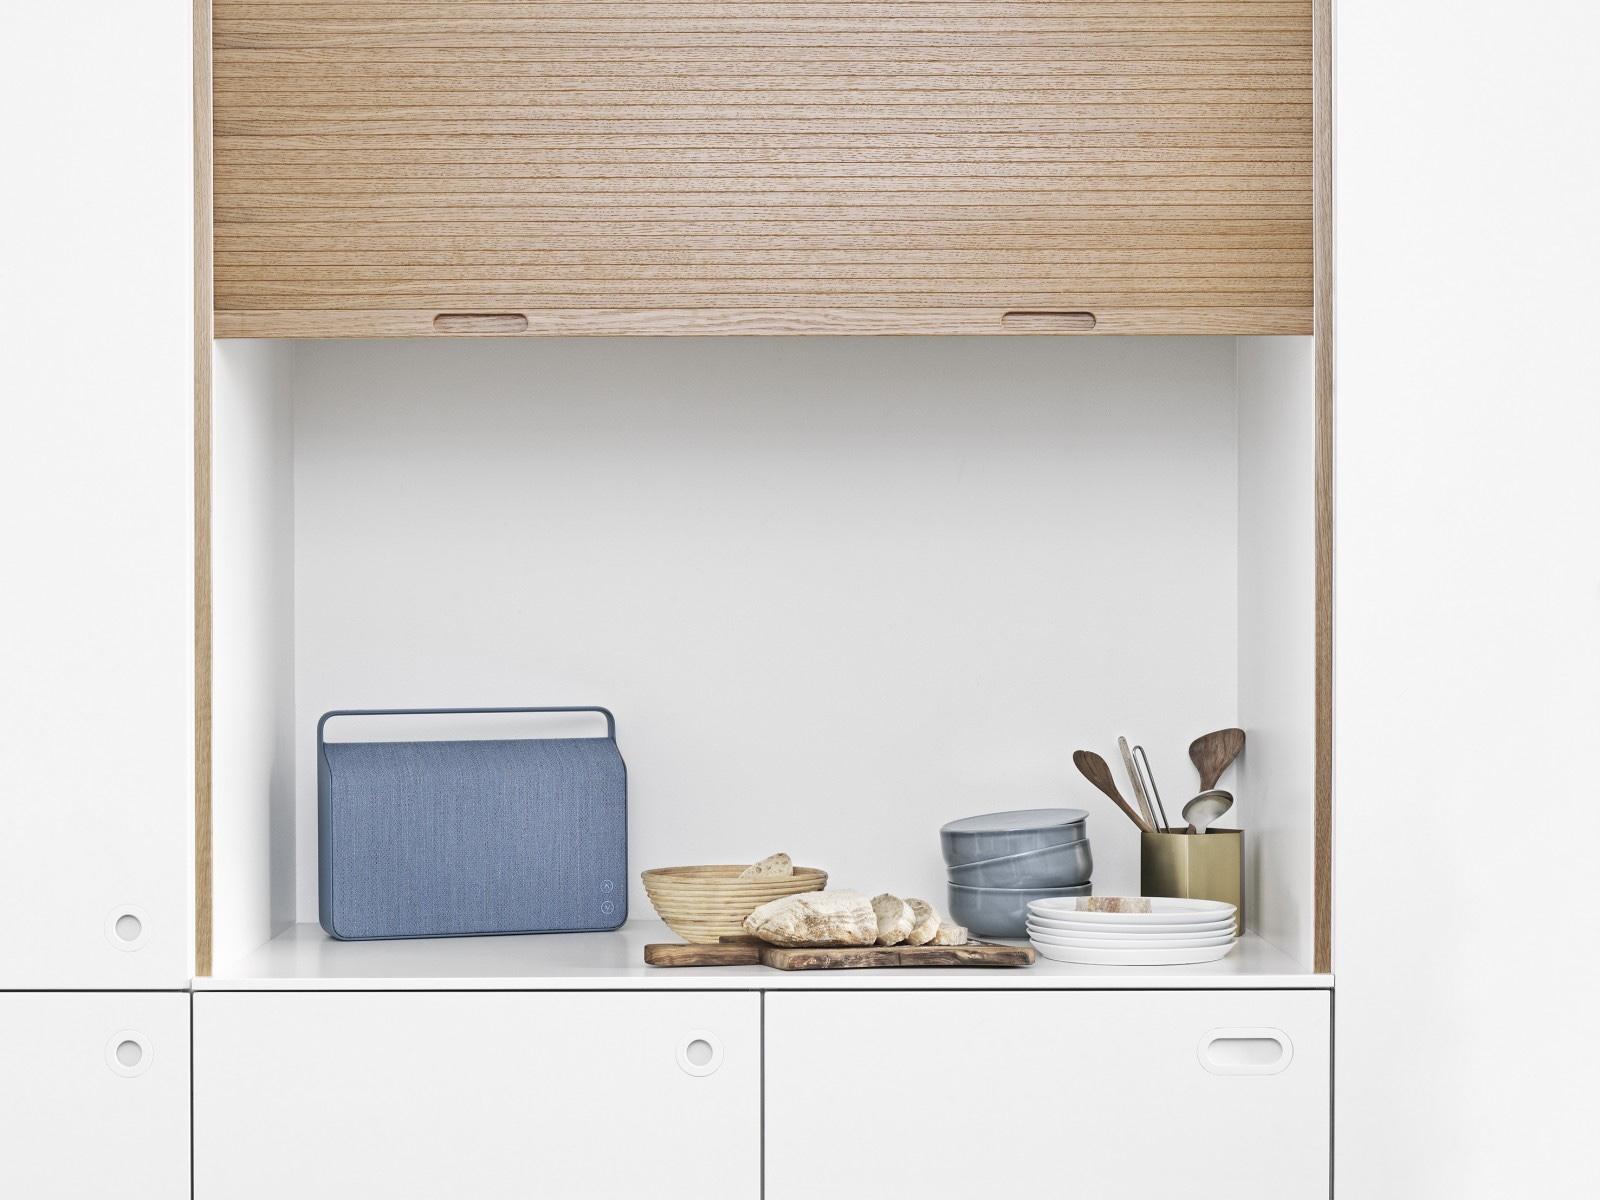 Kvadratproduced aspecially woven textile cover for the 'Copenhagen' loudspeaker from Danish companyVifa. Image viaMidcentury Møbler.